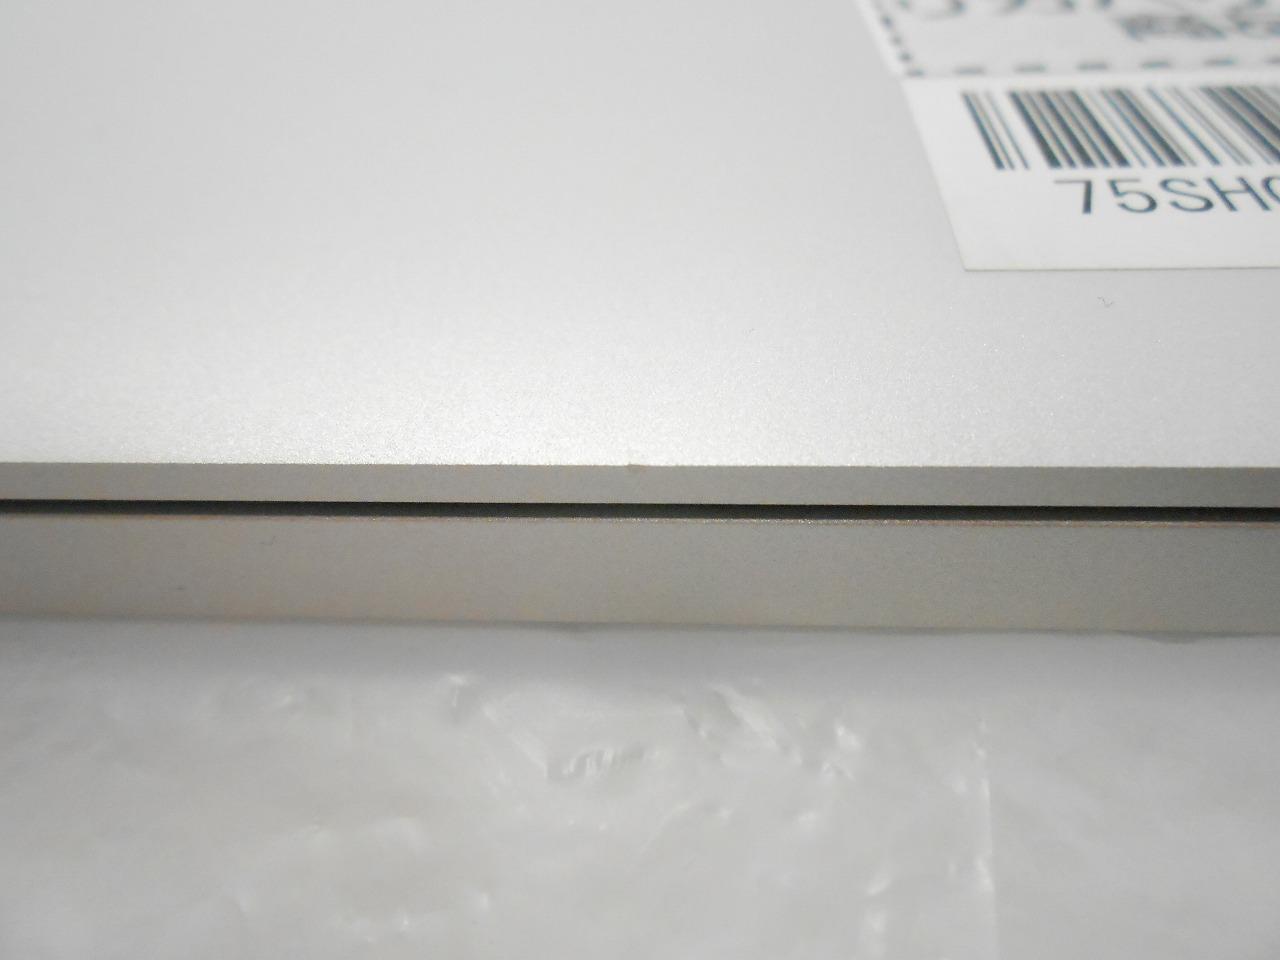 Bランク【中古】 Apple MacBookPro MF841J/A /Early2015/Corei5 5287U 2.9GHz/メモリ8GB/SSD512GB/13インチ/Mac OS X Yosemite 10.10.5【3ヶ月保証】【足立店発送】